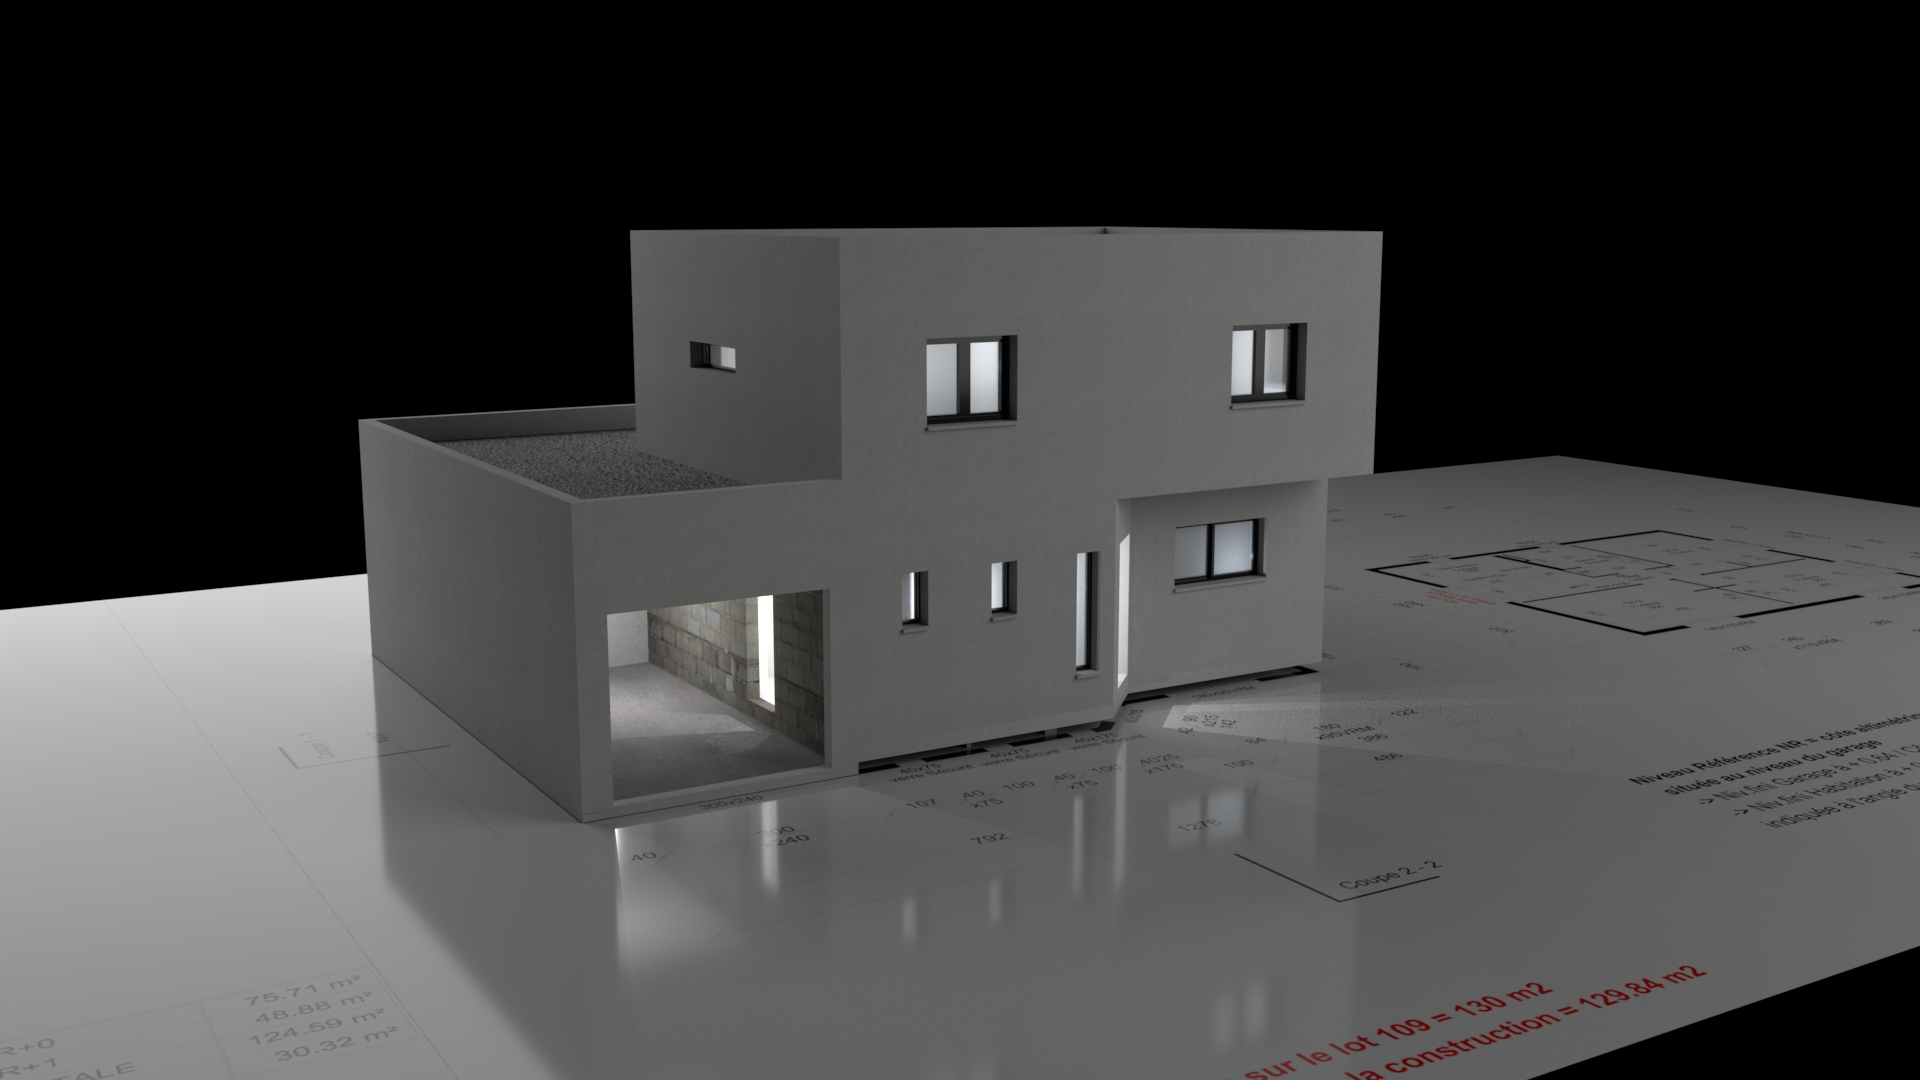 modelisation 3d realite virtuelle montpellier d light production plan5